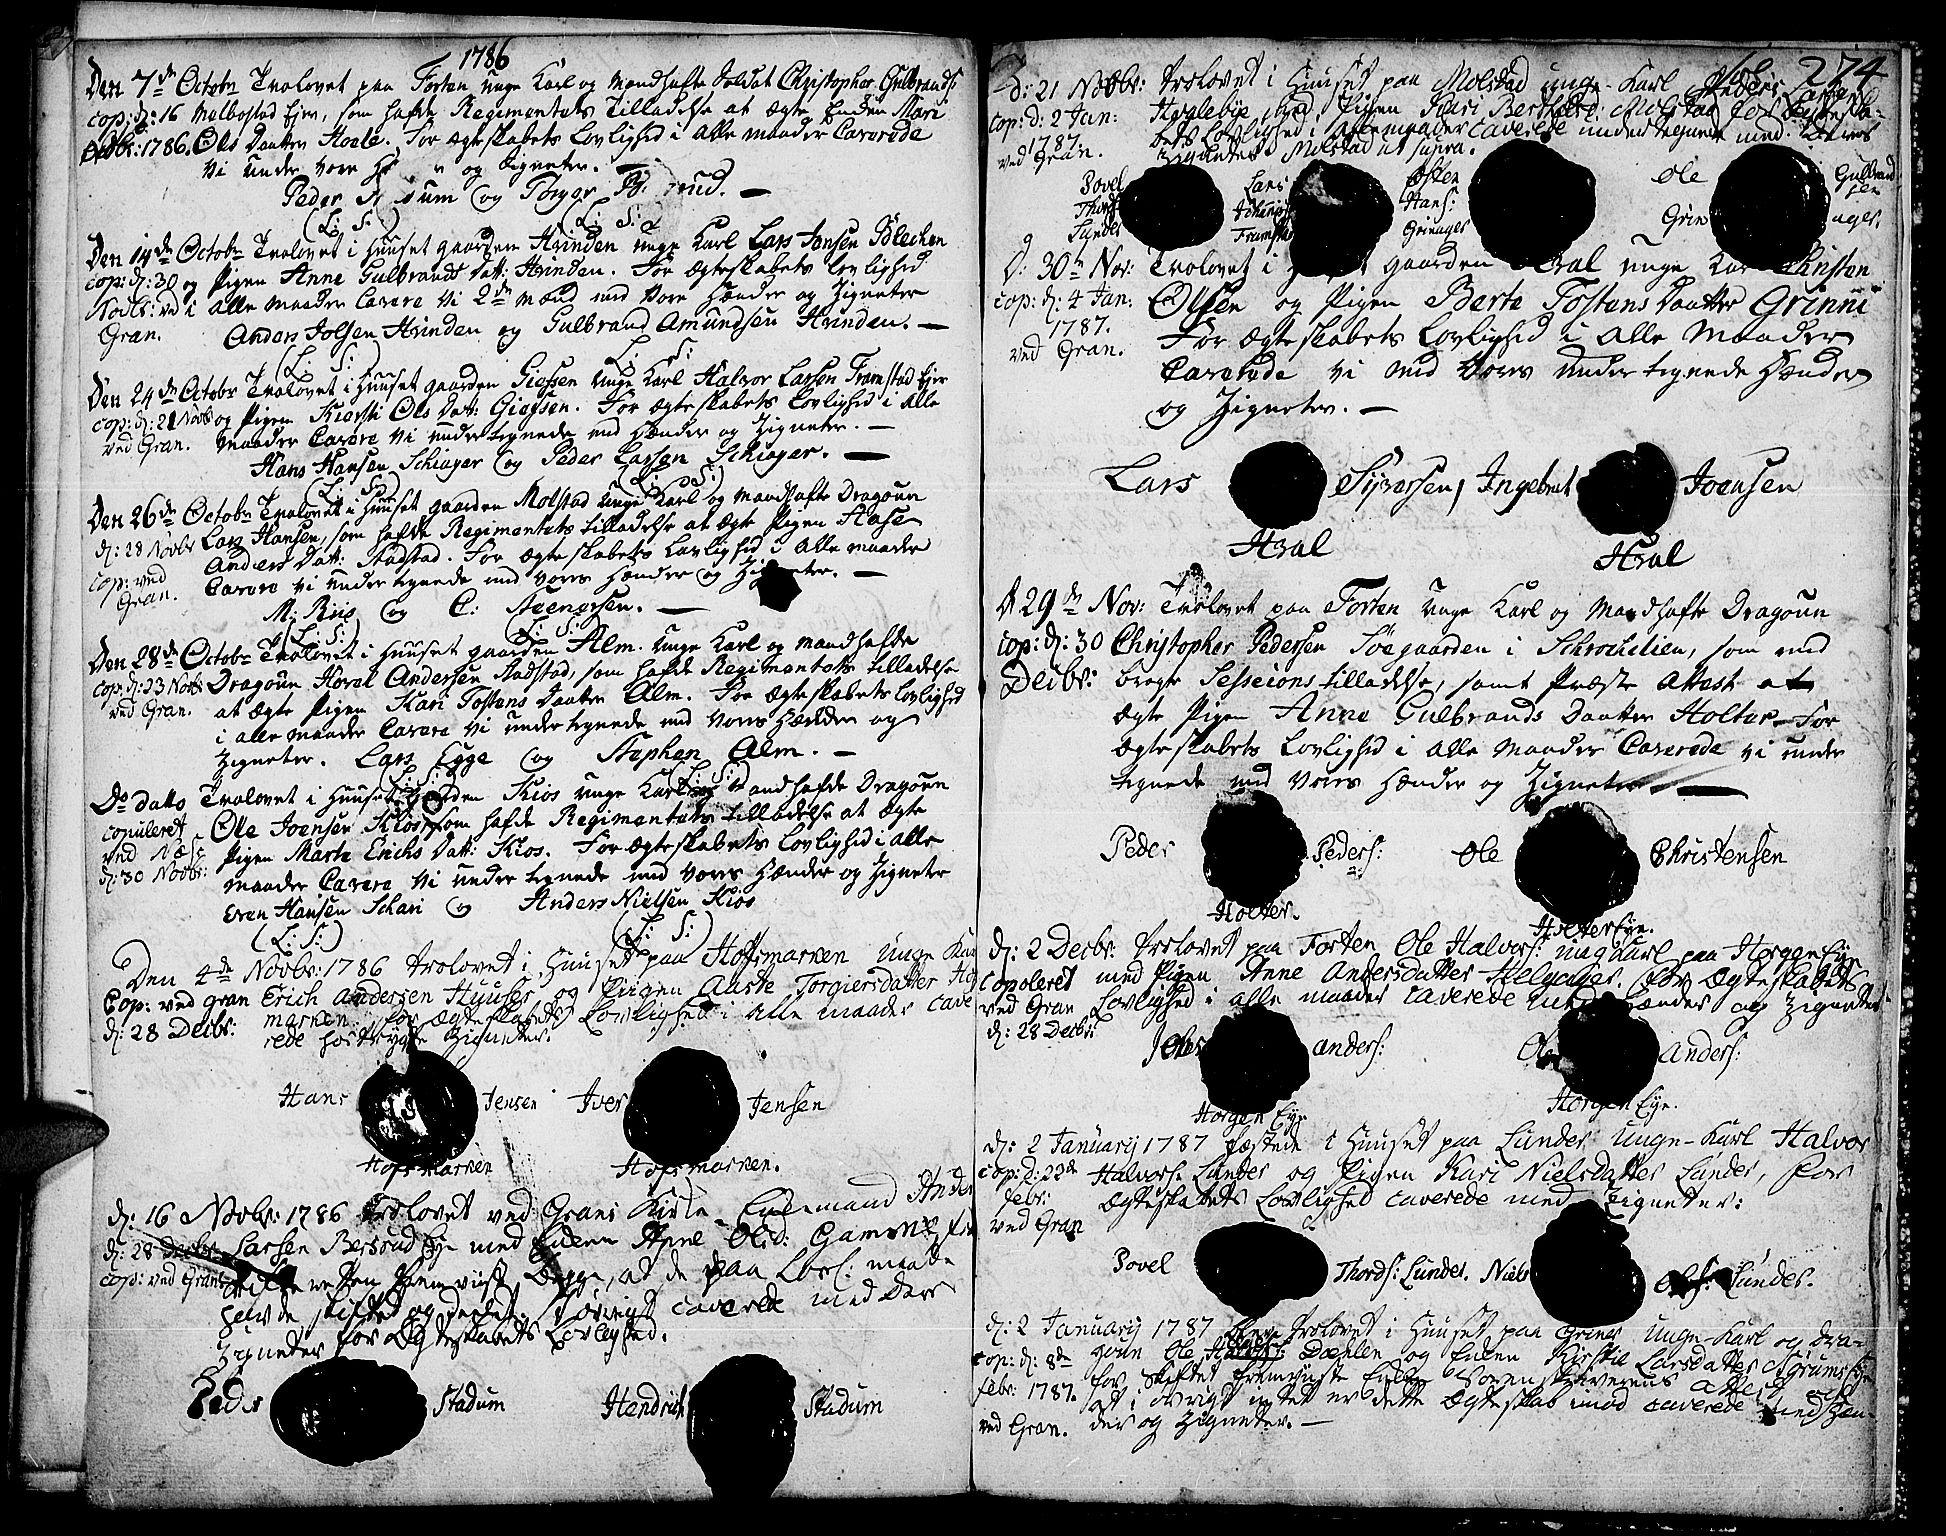 SAH, Gran prestekontor, Ministerialbok nr. 5, 1776-1788, s. 274